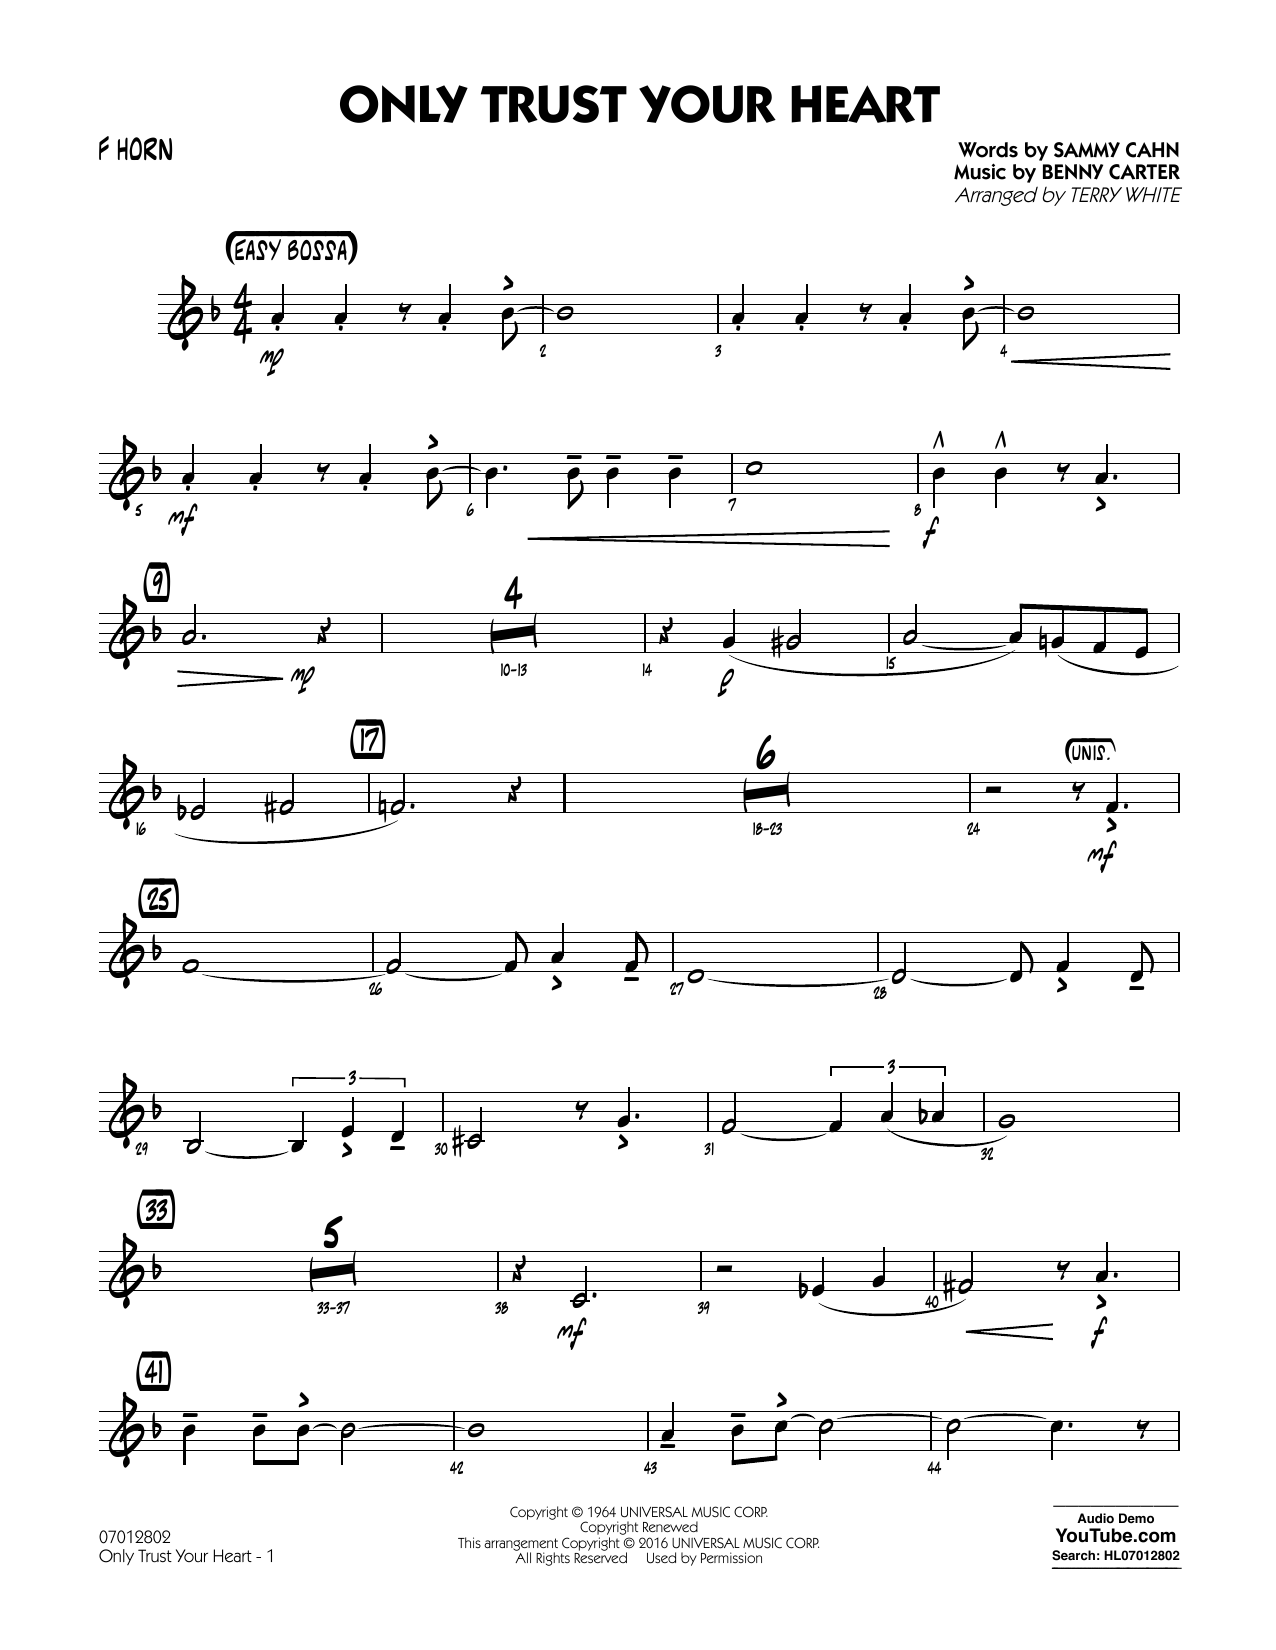 Sammy Cahn - Only Trust Your Heart - F Horn